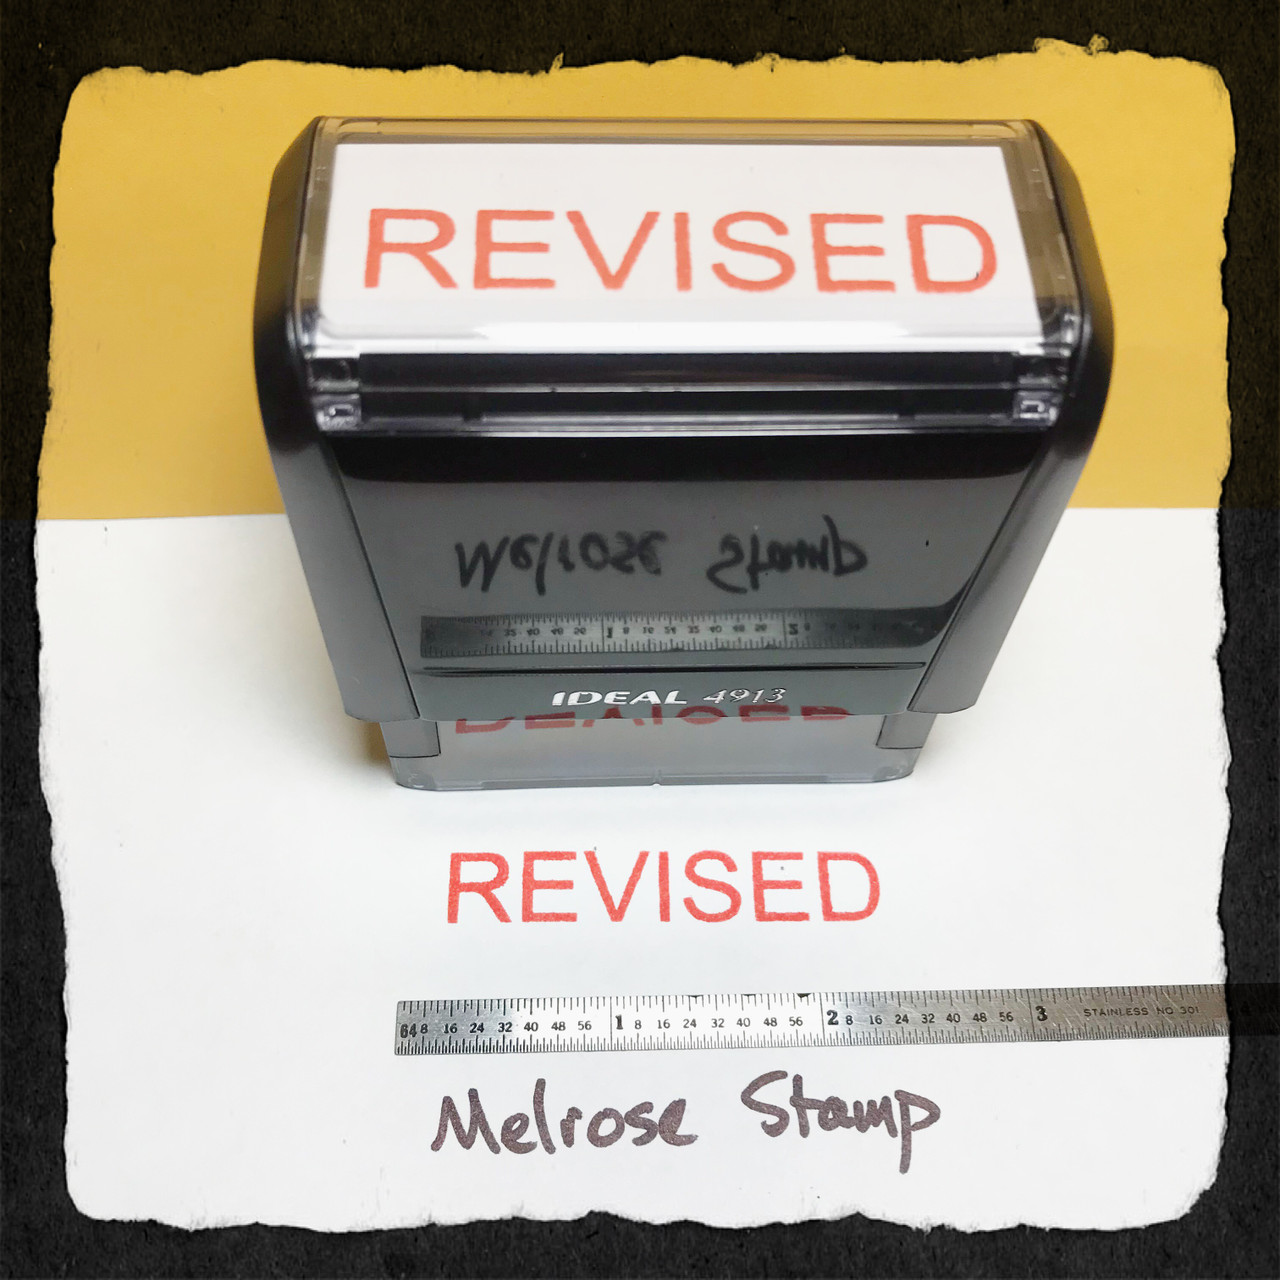 Revised Stamp Red Ink Large